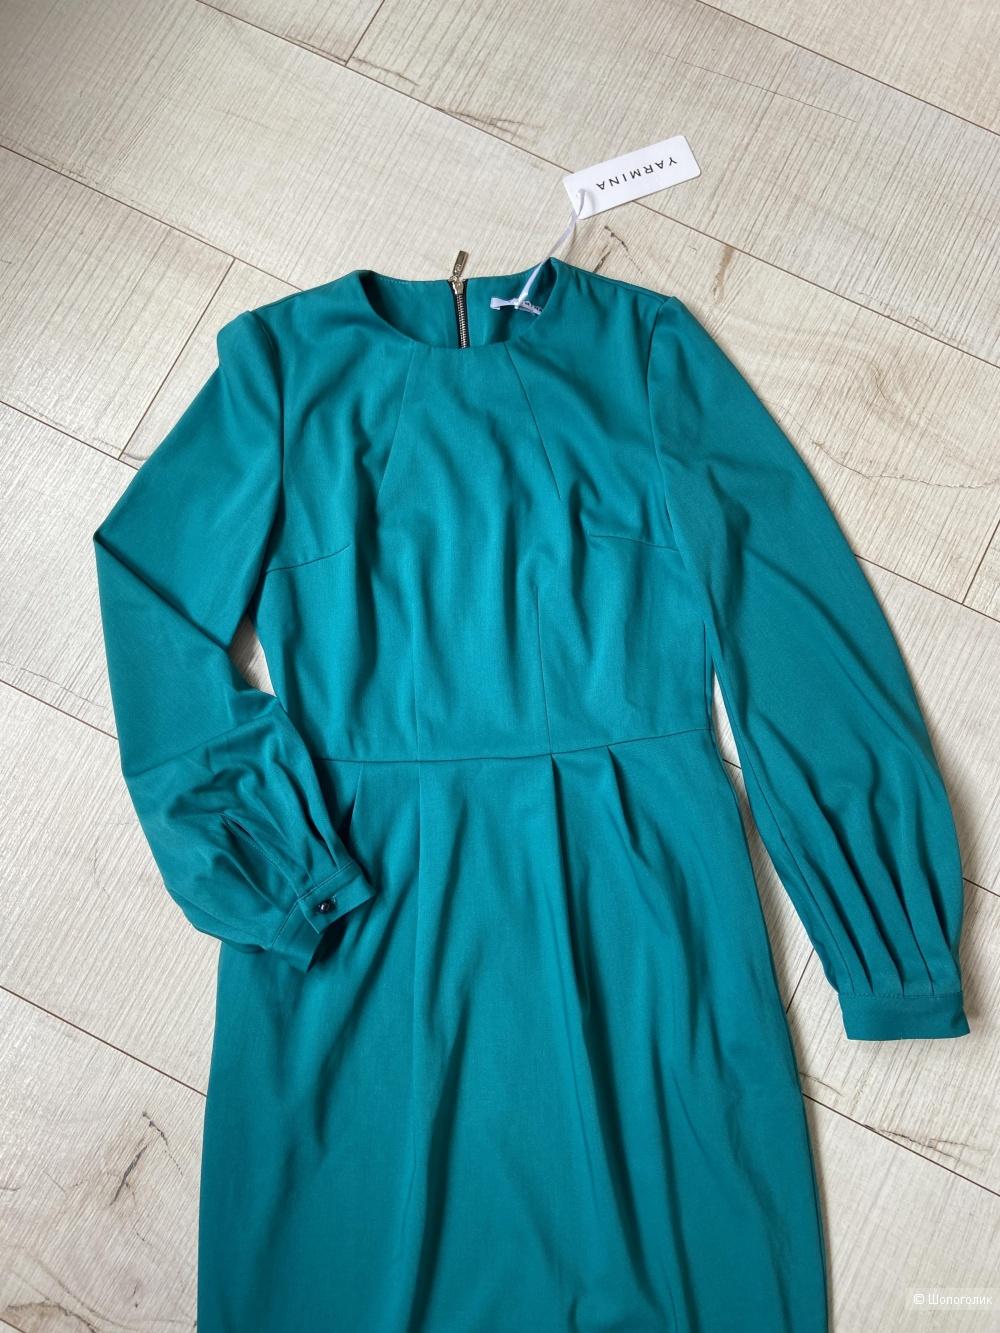 Платье Yarmina, размер 42-44